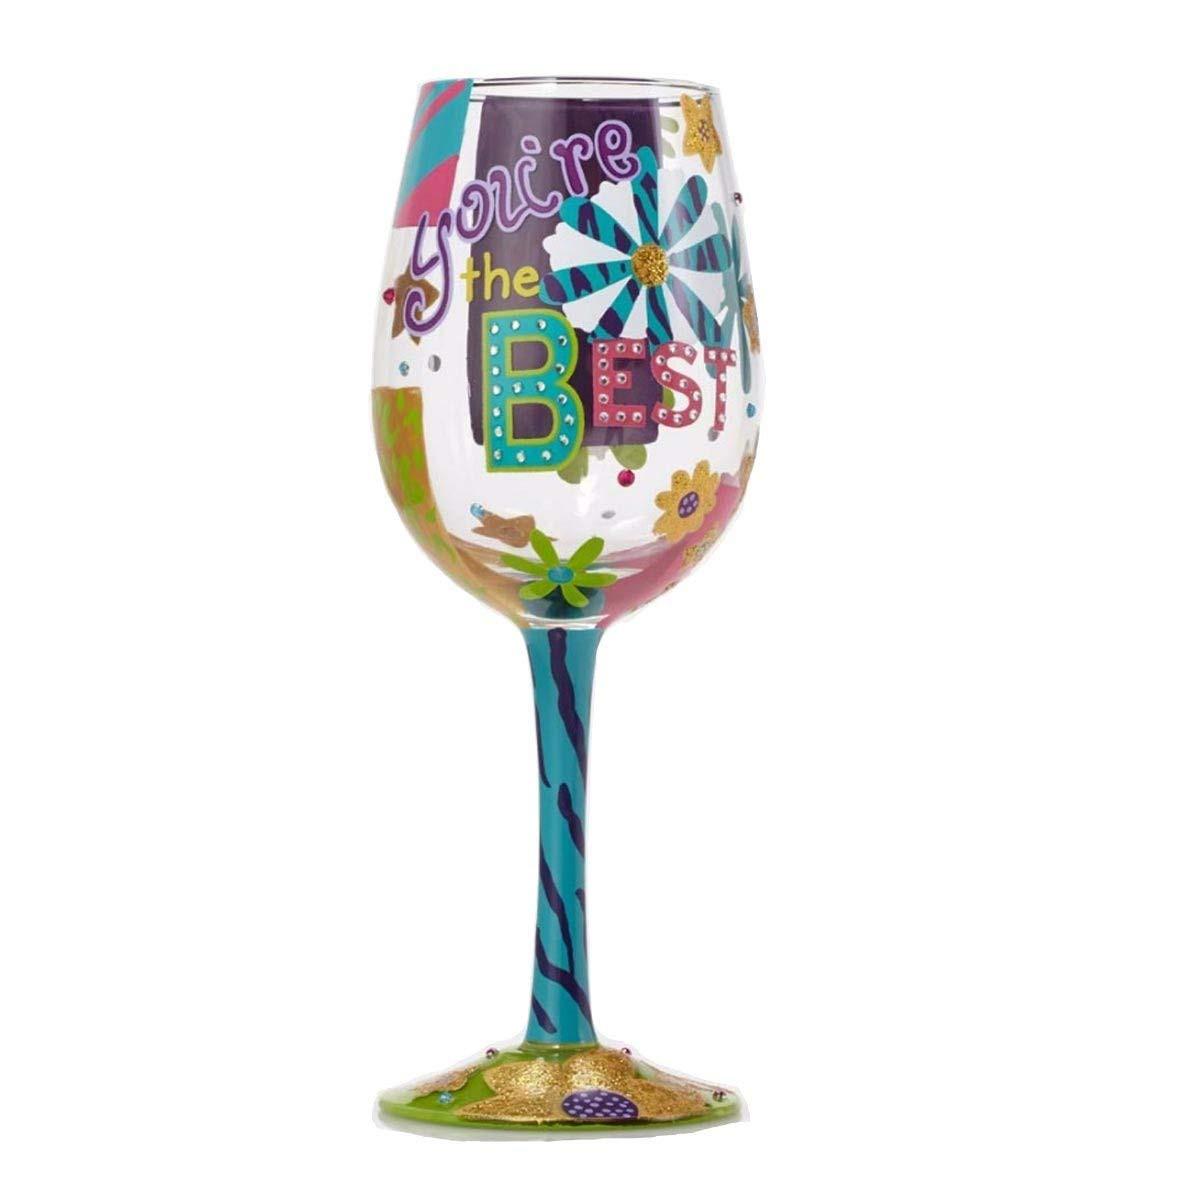 crystal vase engraved gift of amazon com lolita happy retirement artisan painted wine glass gift inside amazon com lolita happy retirement artisan painted wine glass gift wine glasses